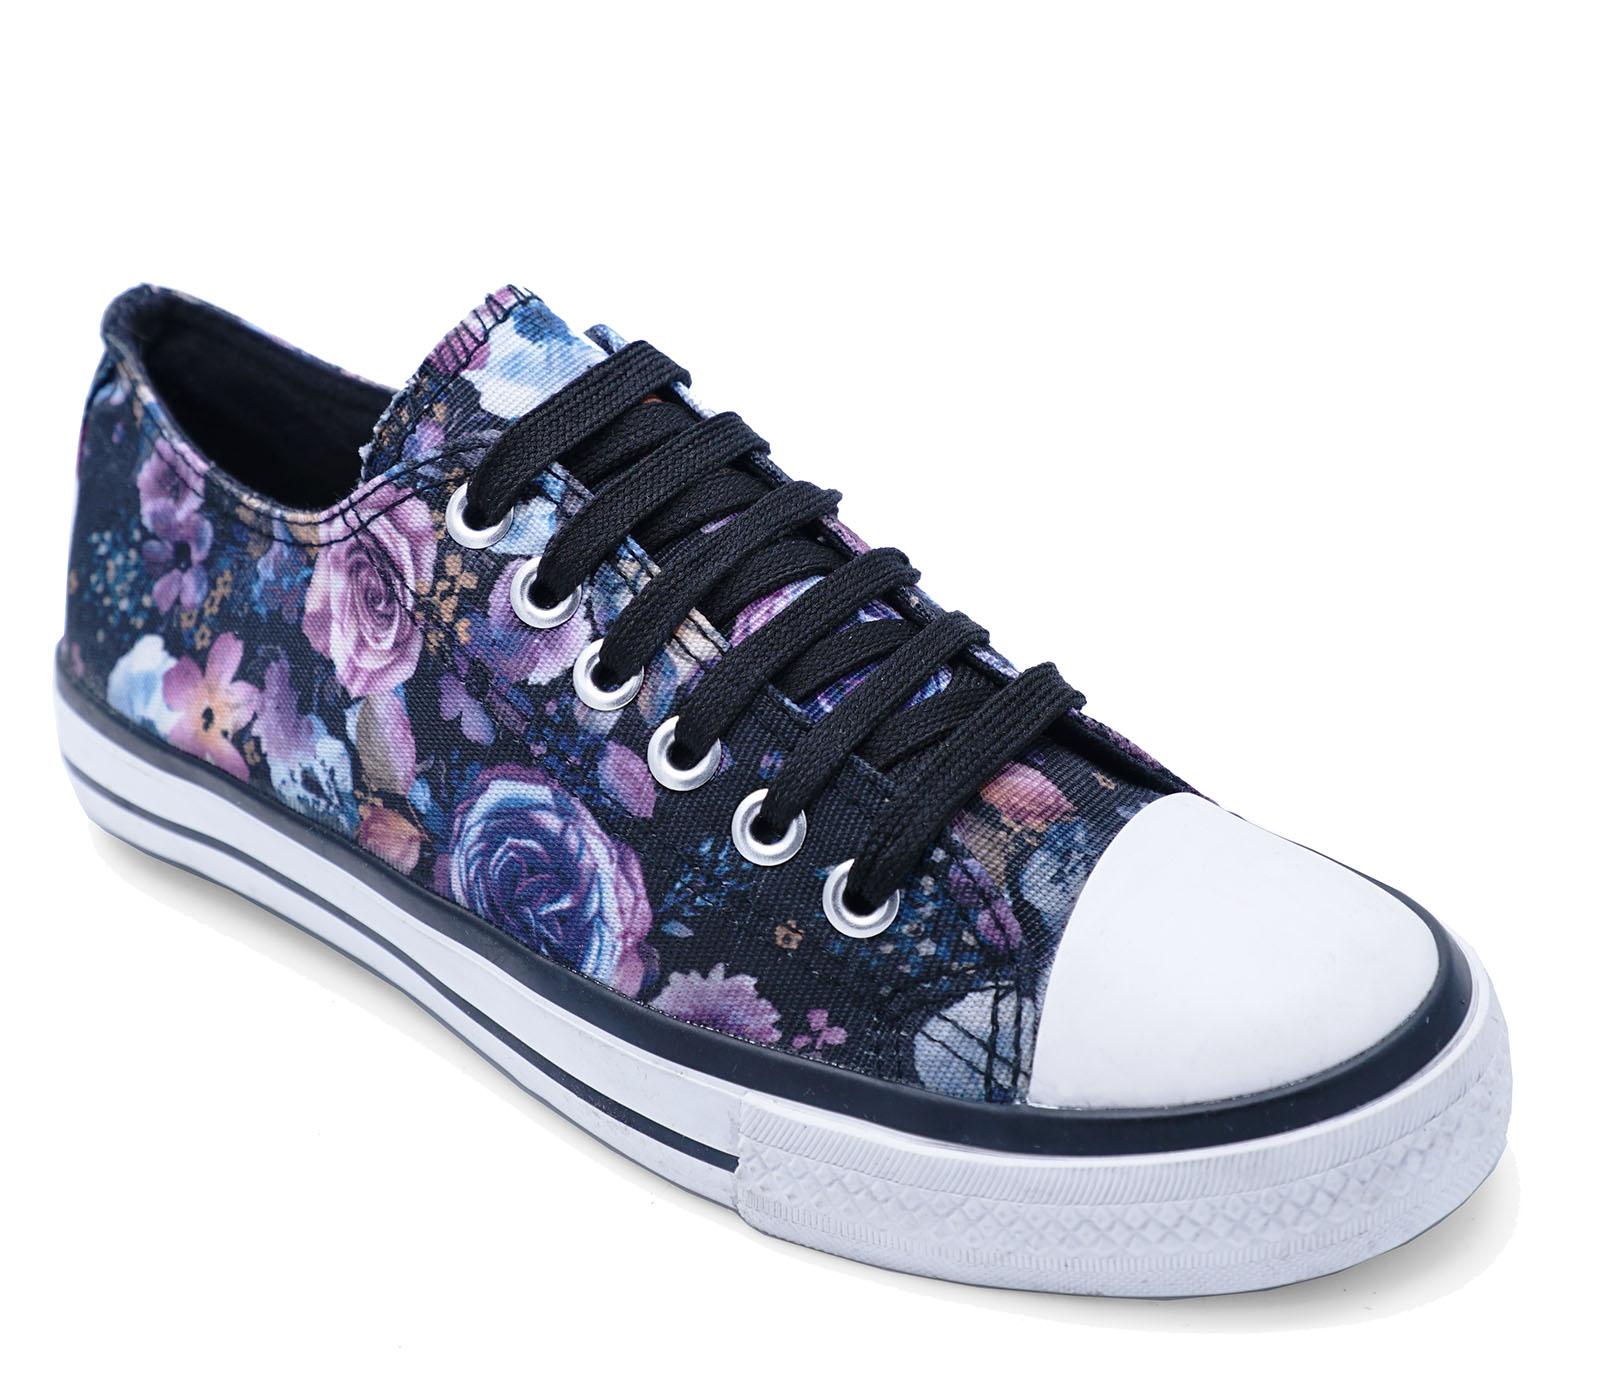 Floral Trainer Shoes 8 Black 3 Ladies Plimsoll Pumps Flat Lace Casual Canvas up UCnqgS